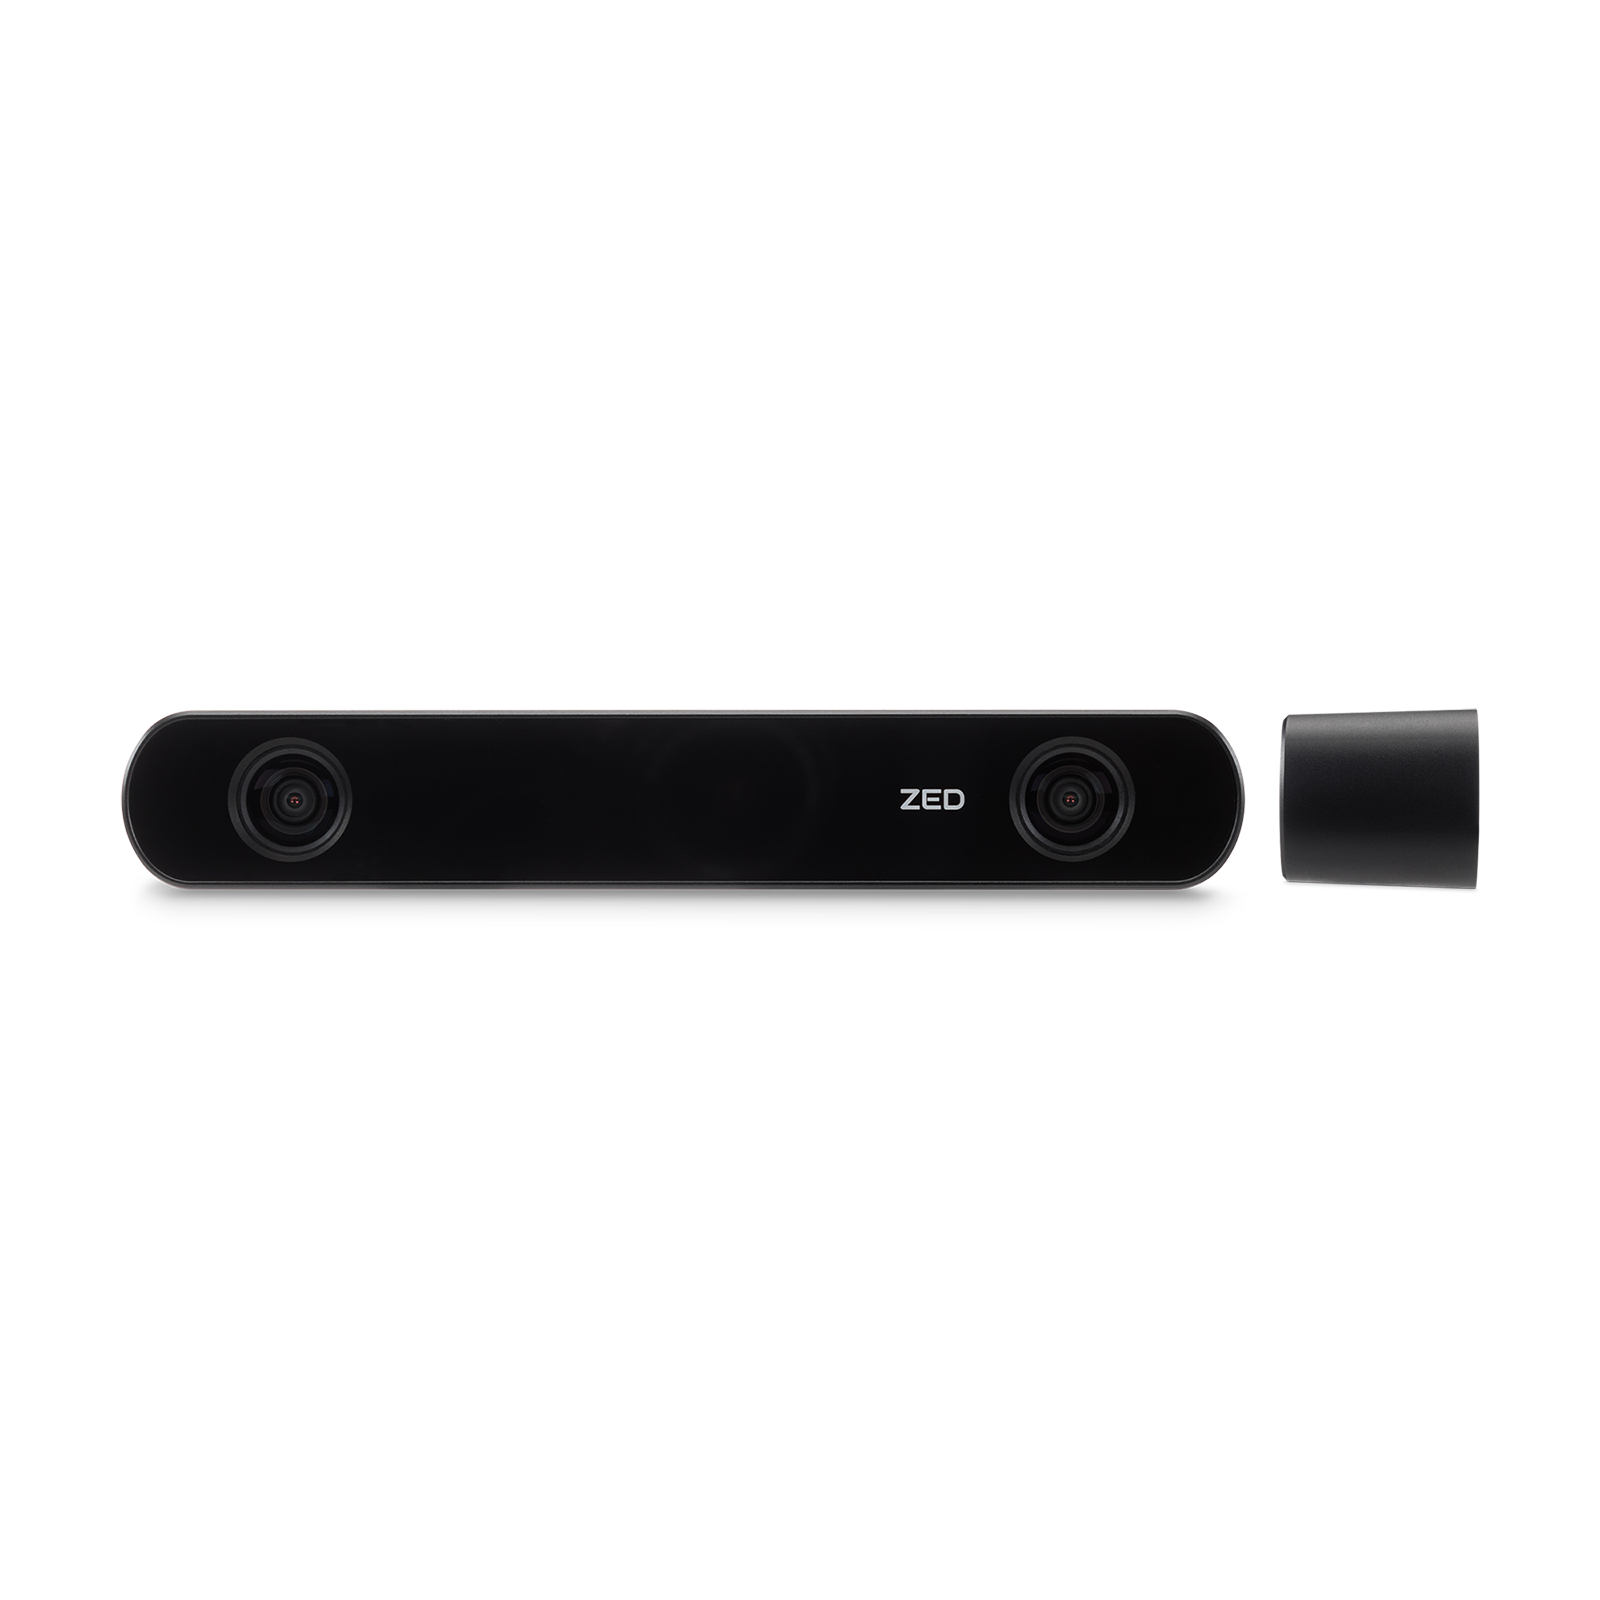 Camera product image